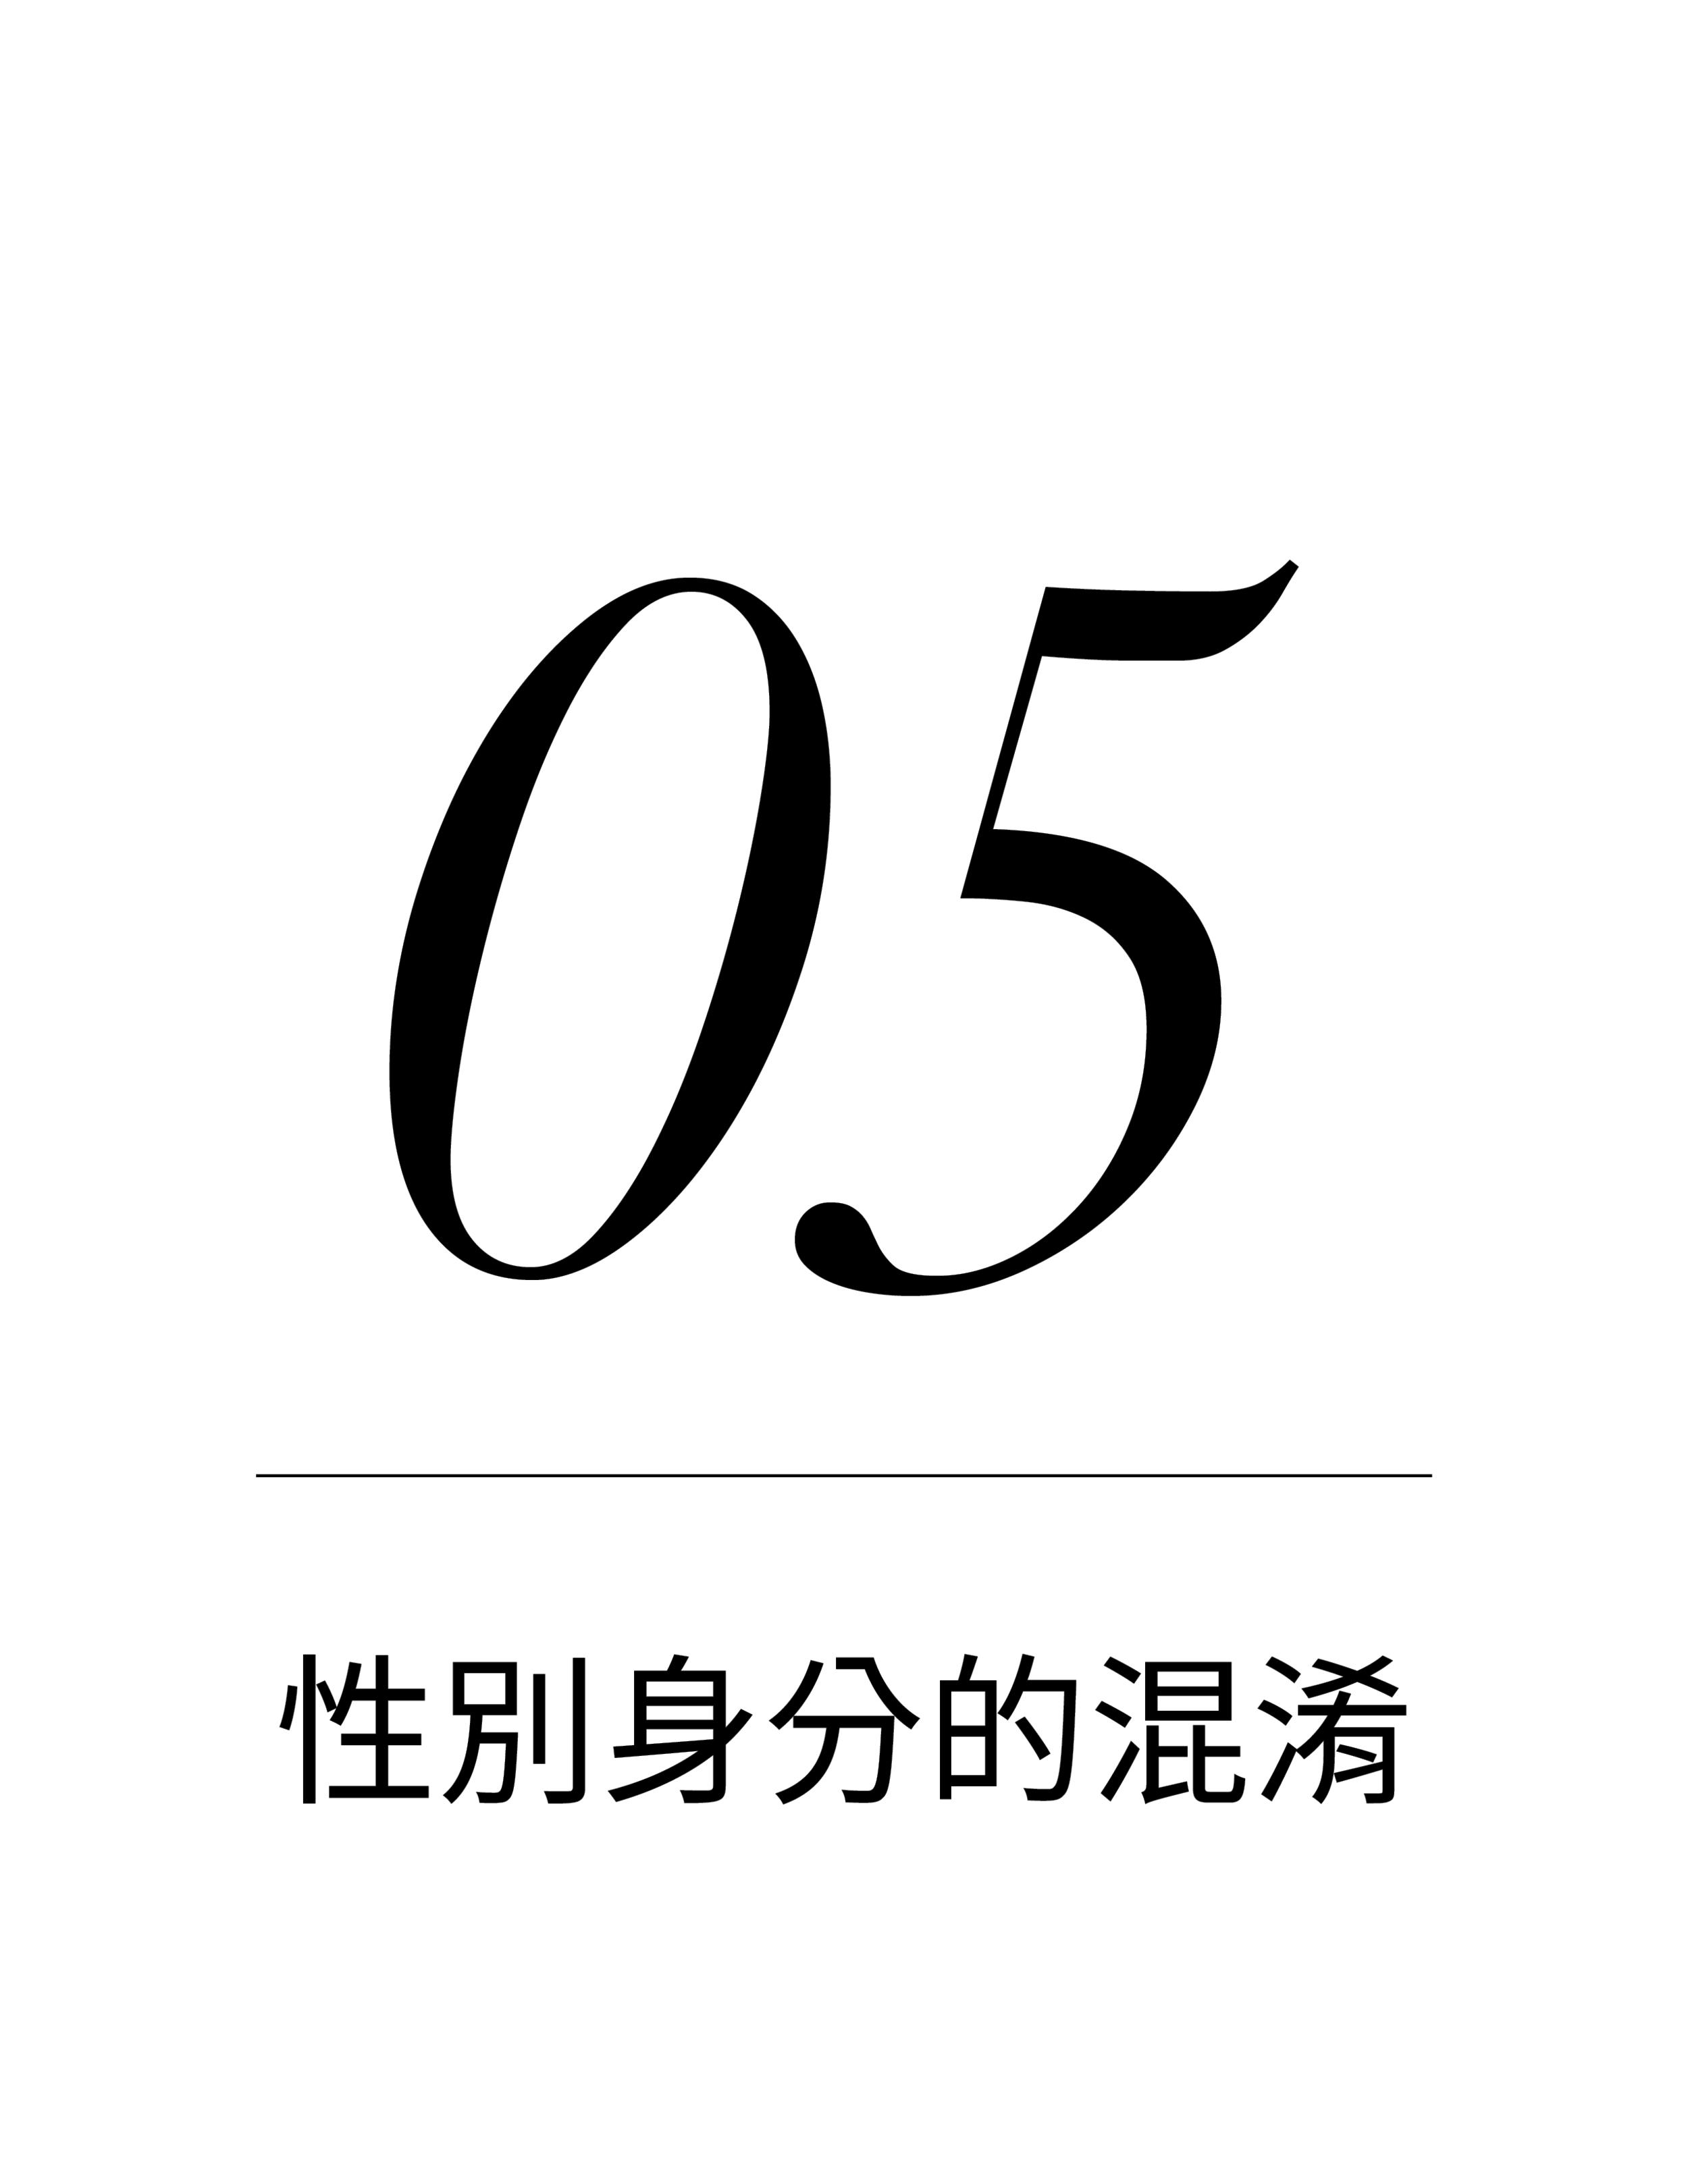 Challenge5.png